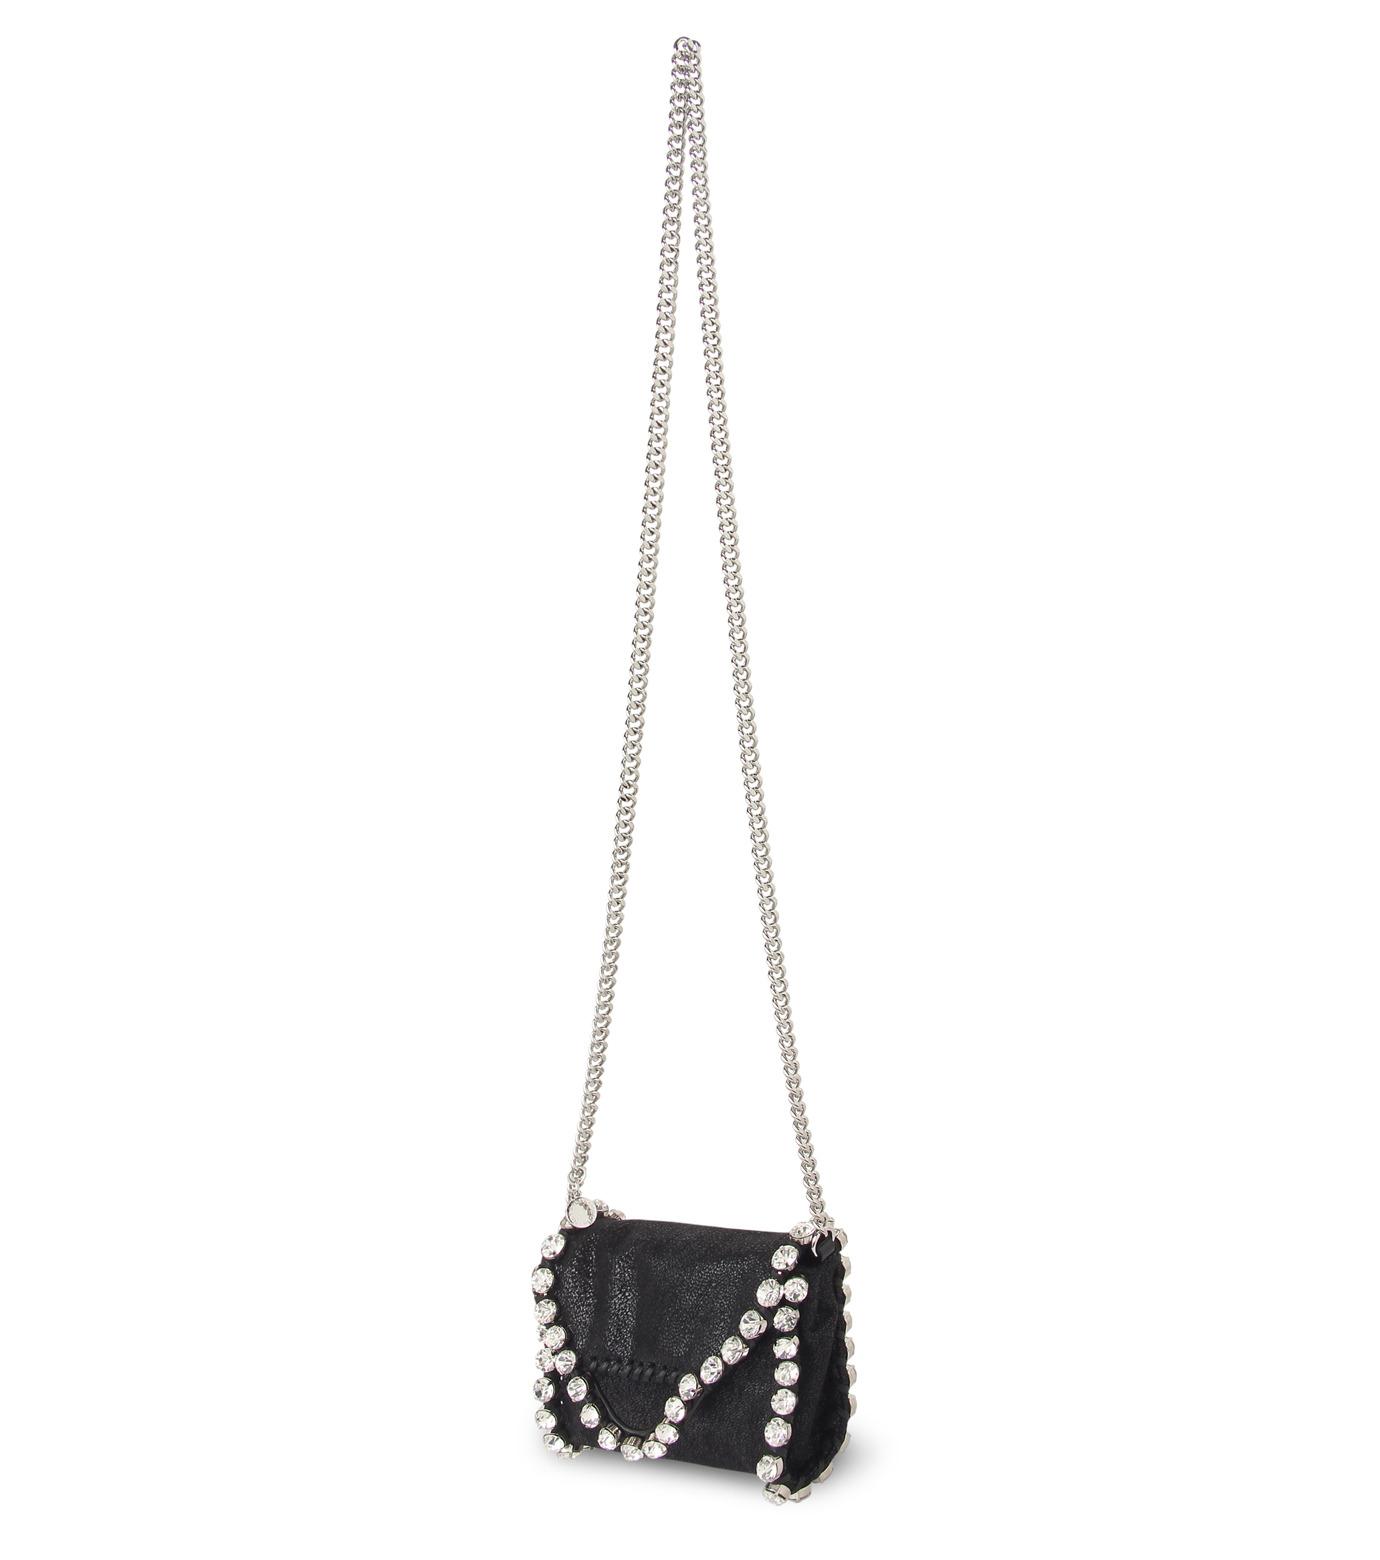 Stella McCartney(ステラマッカートニー)のTiny Fold Over Cross-Body-BLACK(バッグ/ショルダーバッグ/bag/shoulder bag)-391697-W9746-13 拡大詳細画像2